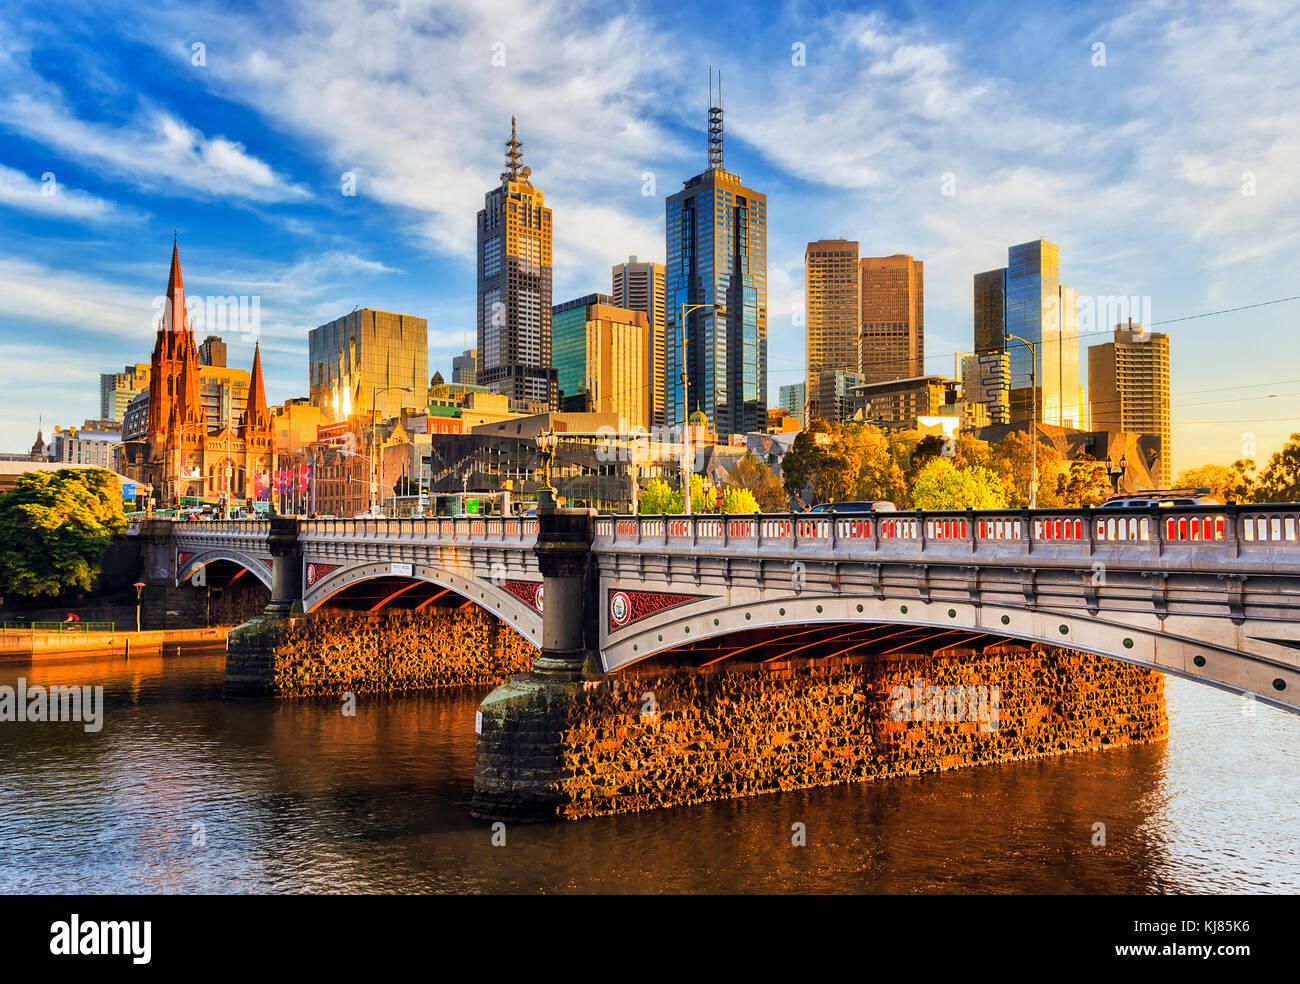 Mattina calda luce su alti torri in Melbourne CBD sopra Princes ponte sul fiume Yarra. Immagini Stock